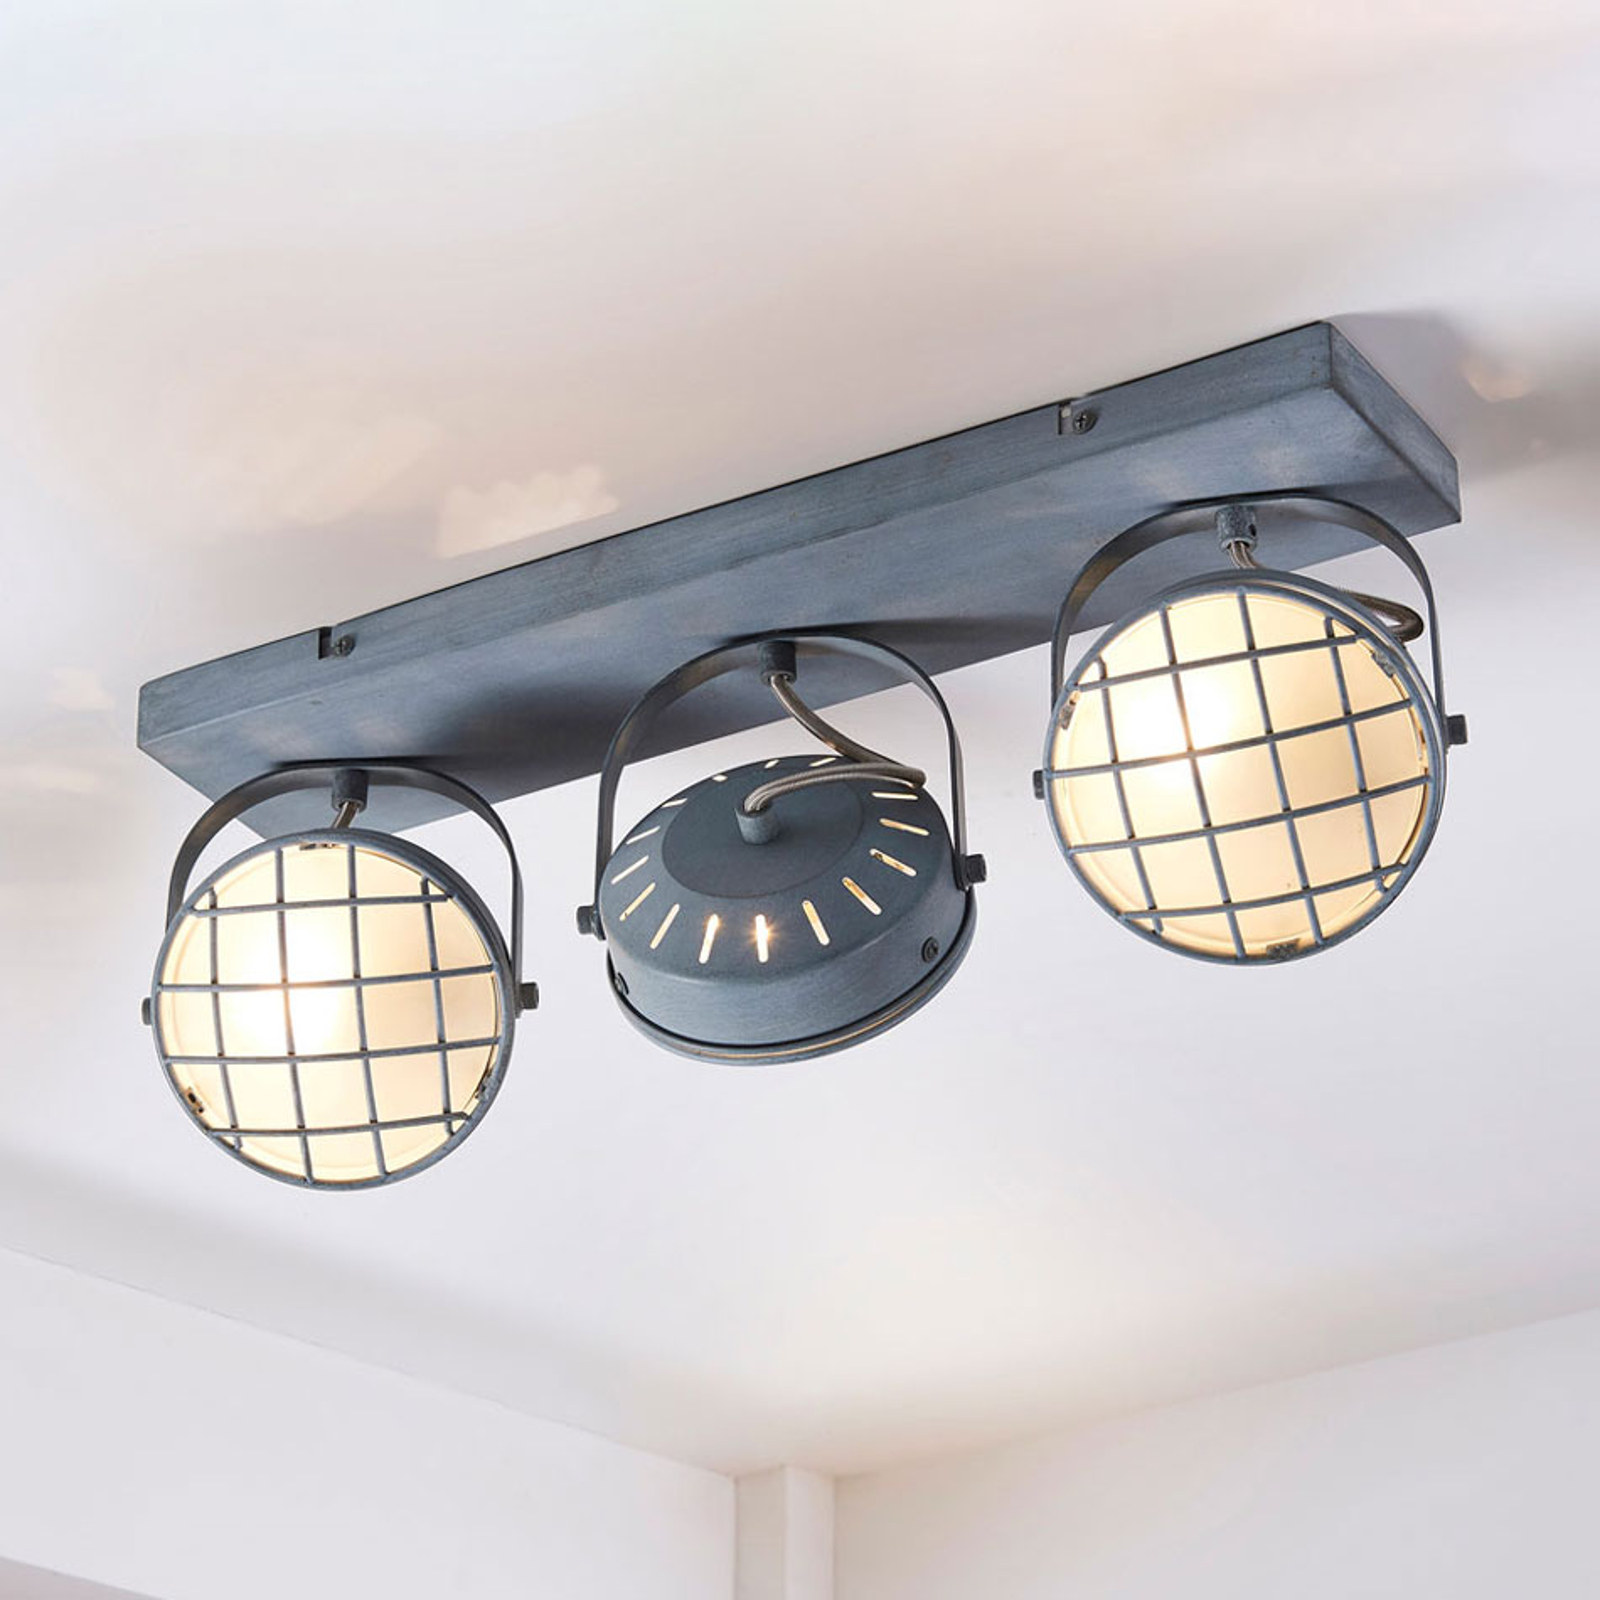 Plafonnier LED Tamin gris, style industriel